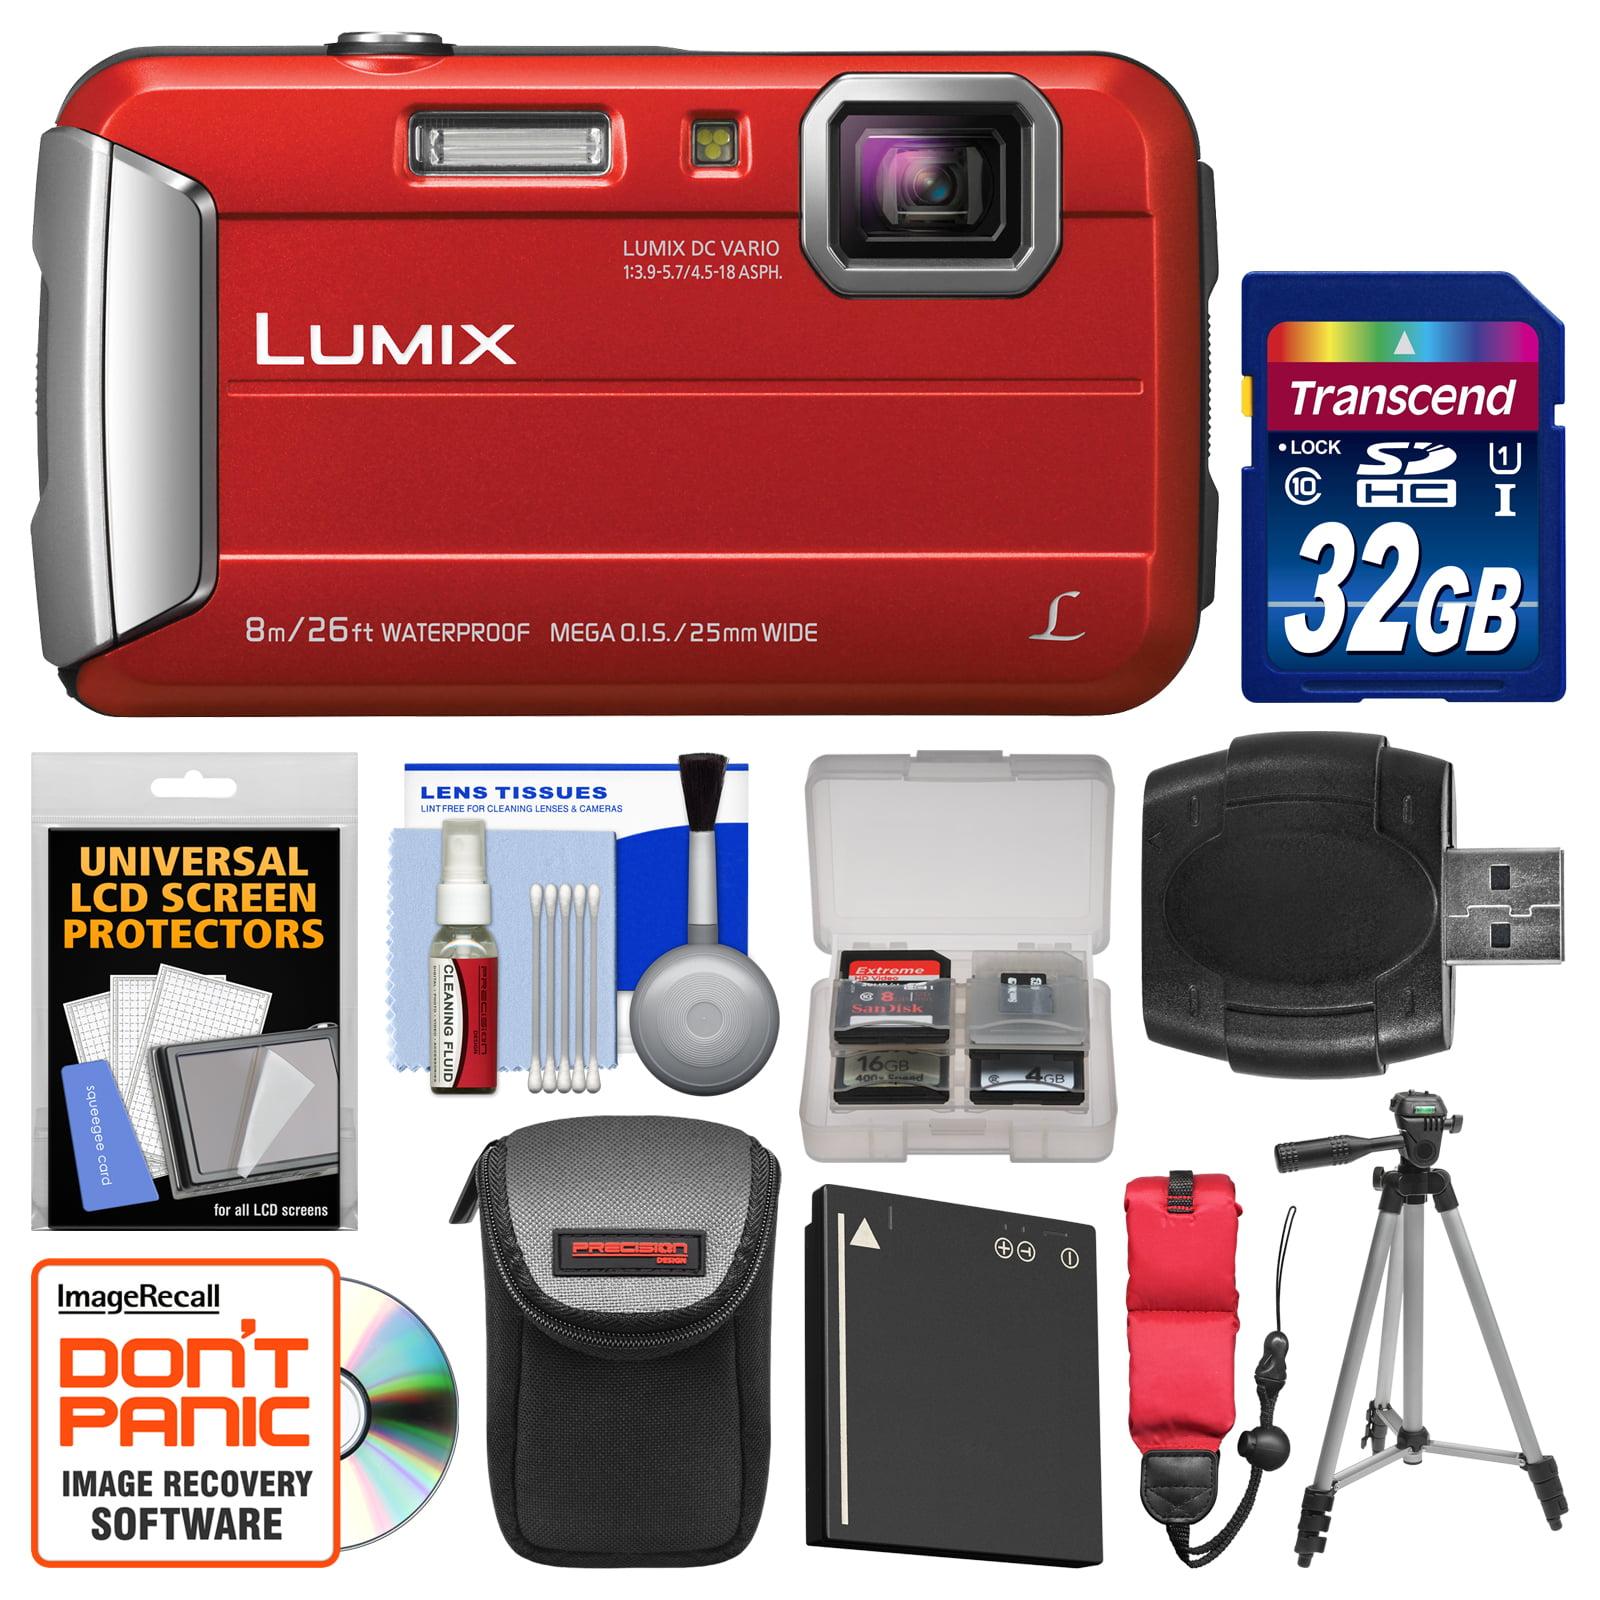 Panasonic Lumix DMC-TS30 Tough Shock & Waterproof Digital Camera (Red) with 32GB Card + Case + Battery + Tripod + Float Strap + Kit